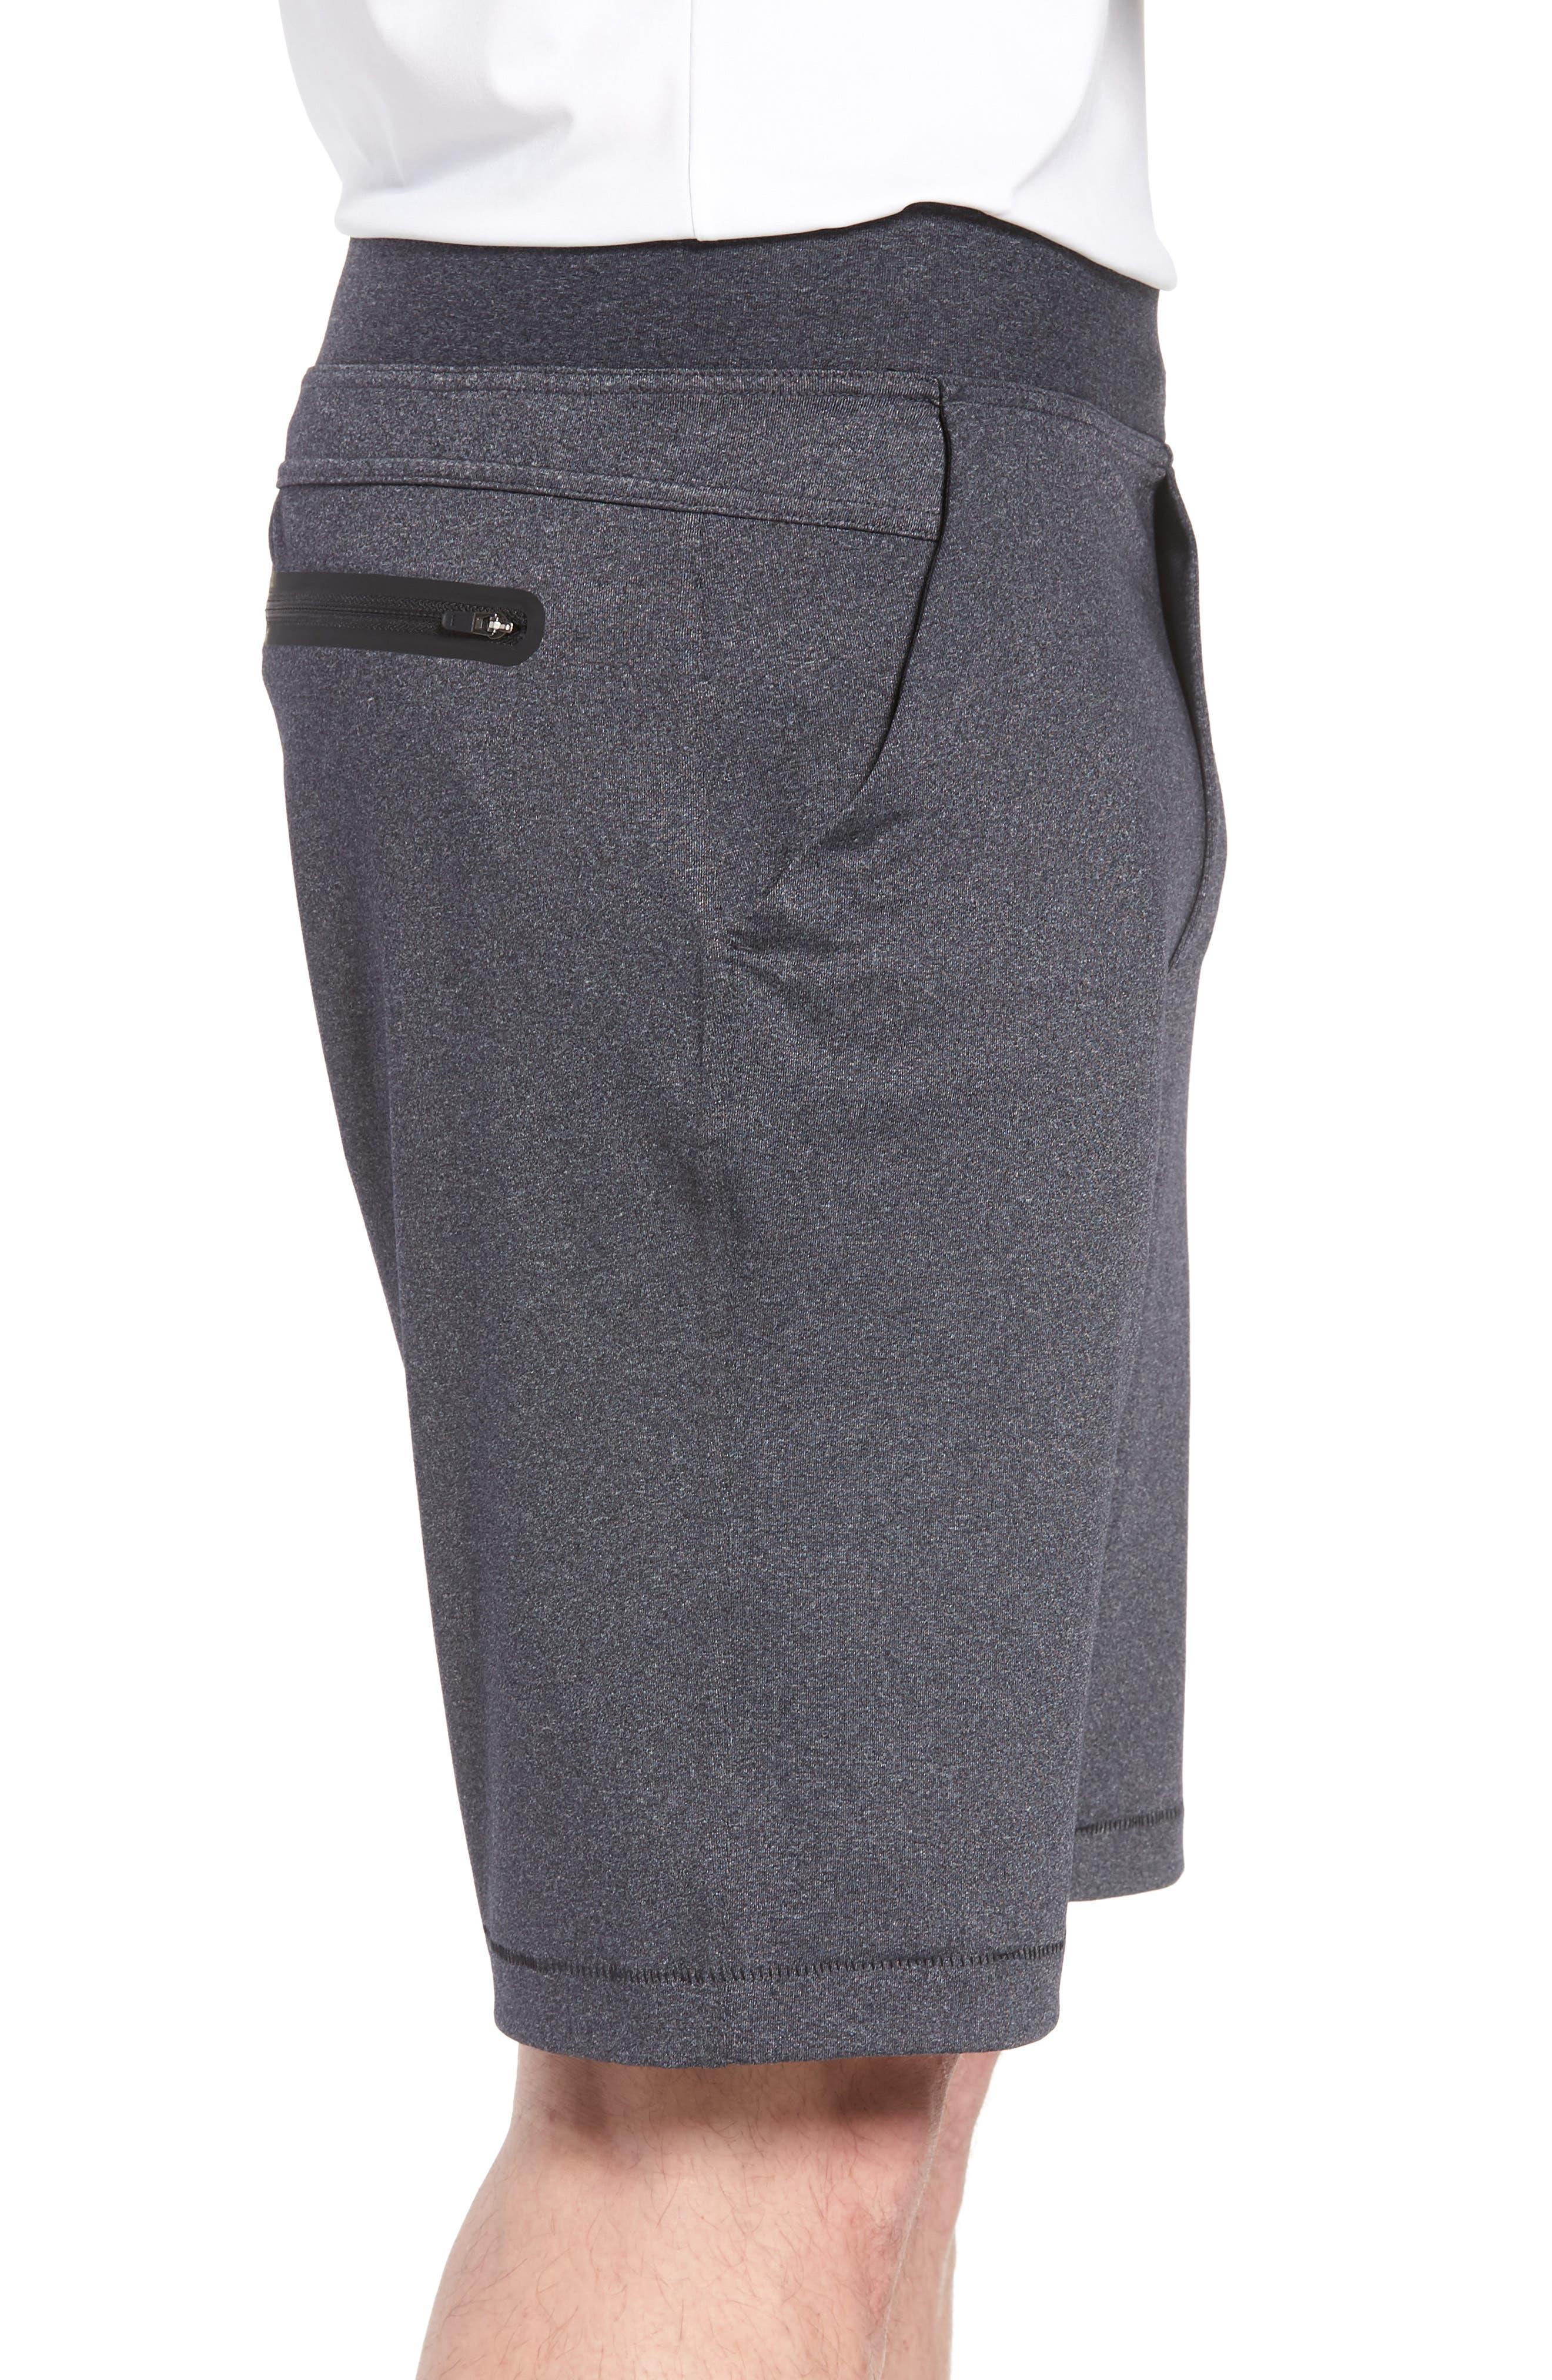 206 Shorts,                             Alternate thumbnail 3, color,                             Charcoal